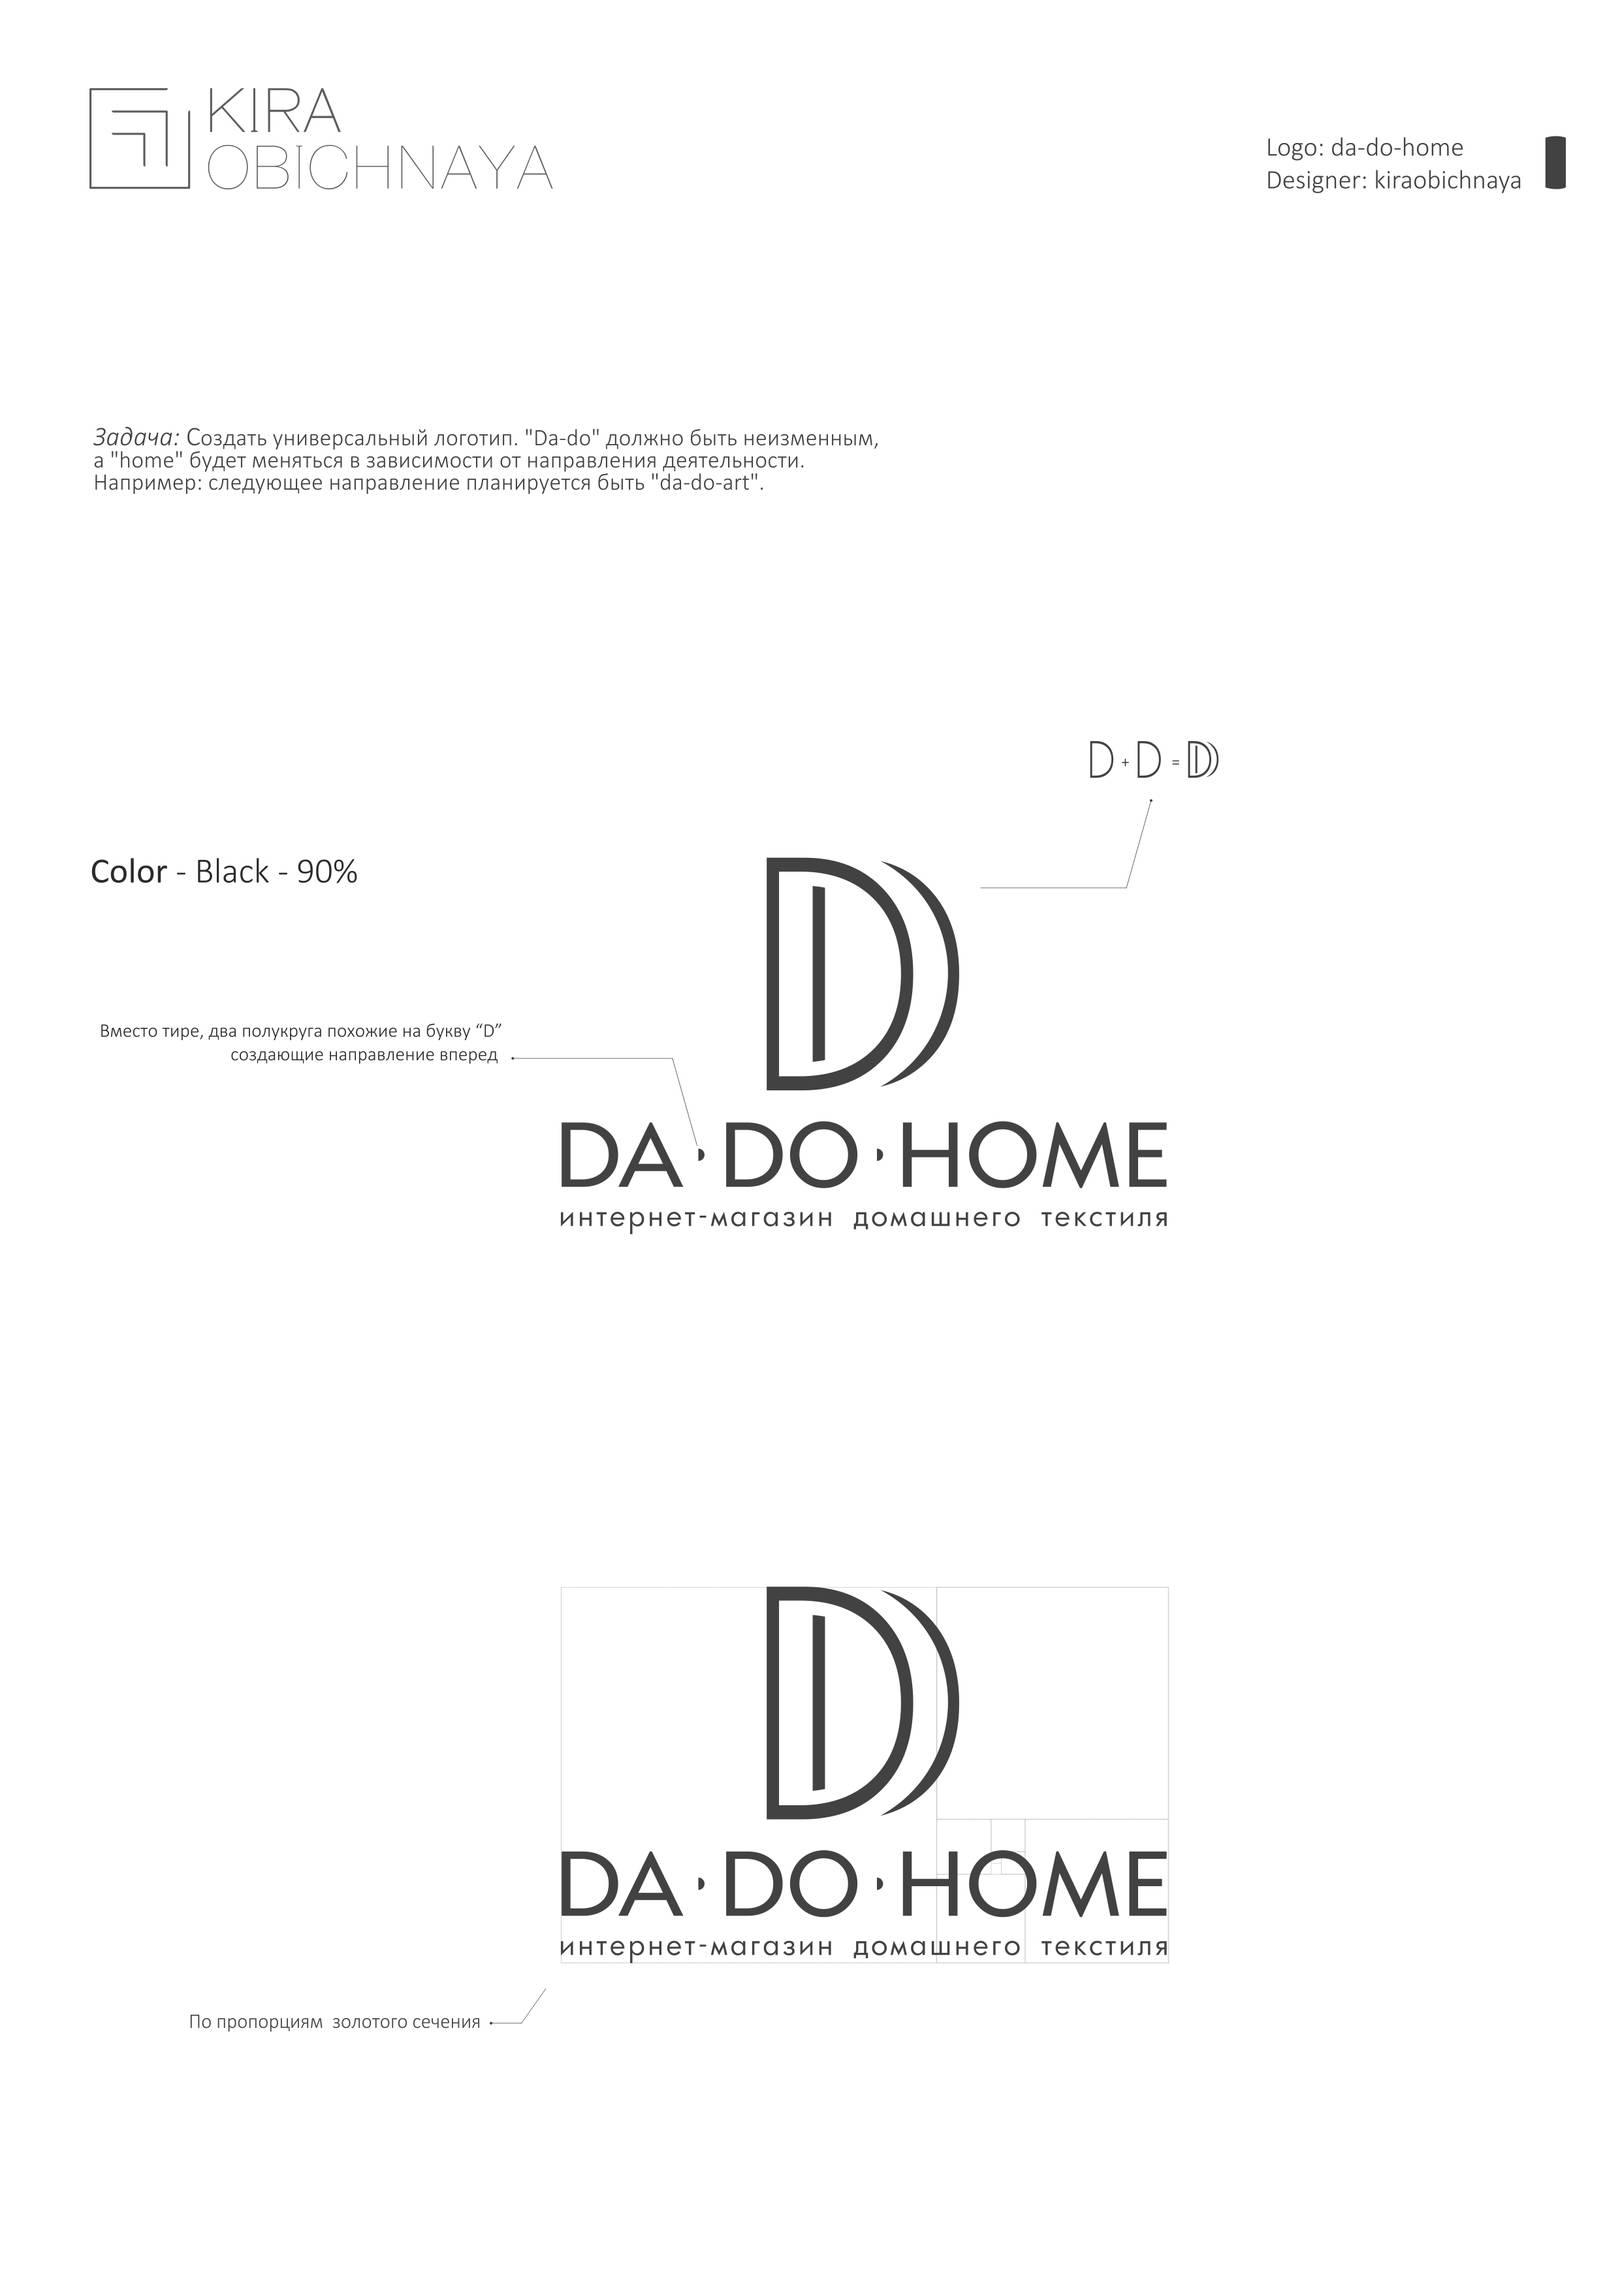 da-do-home